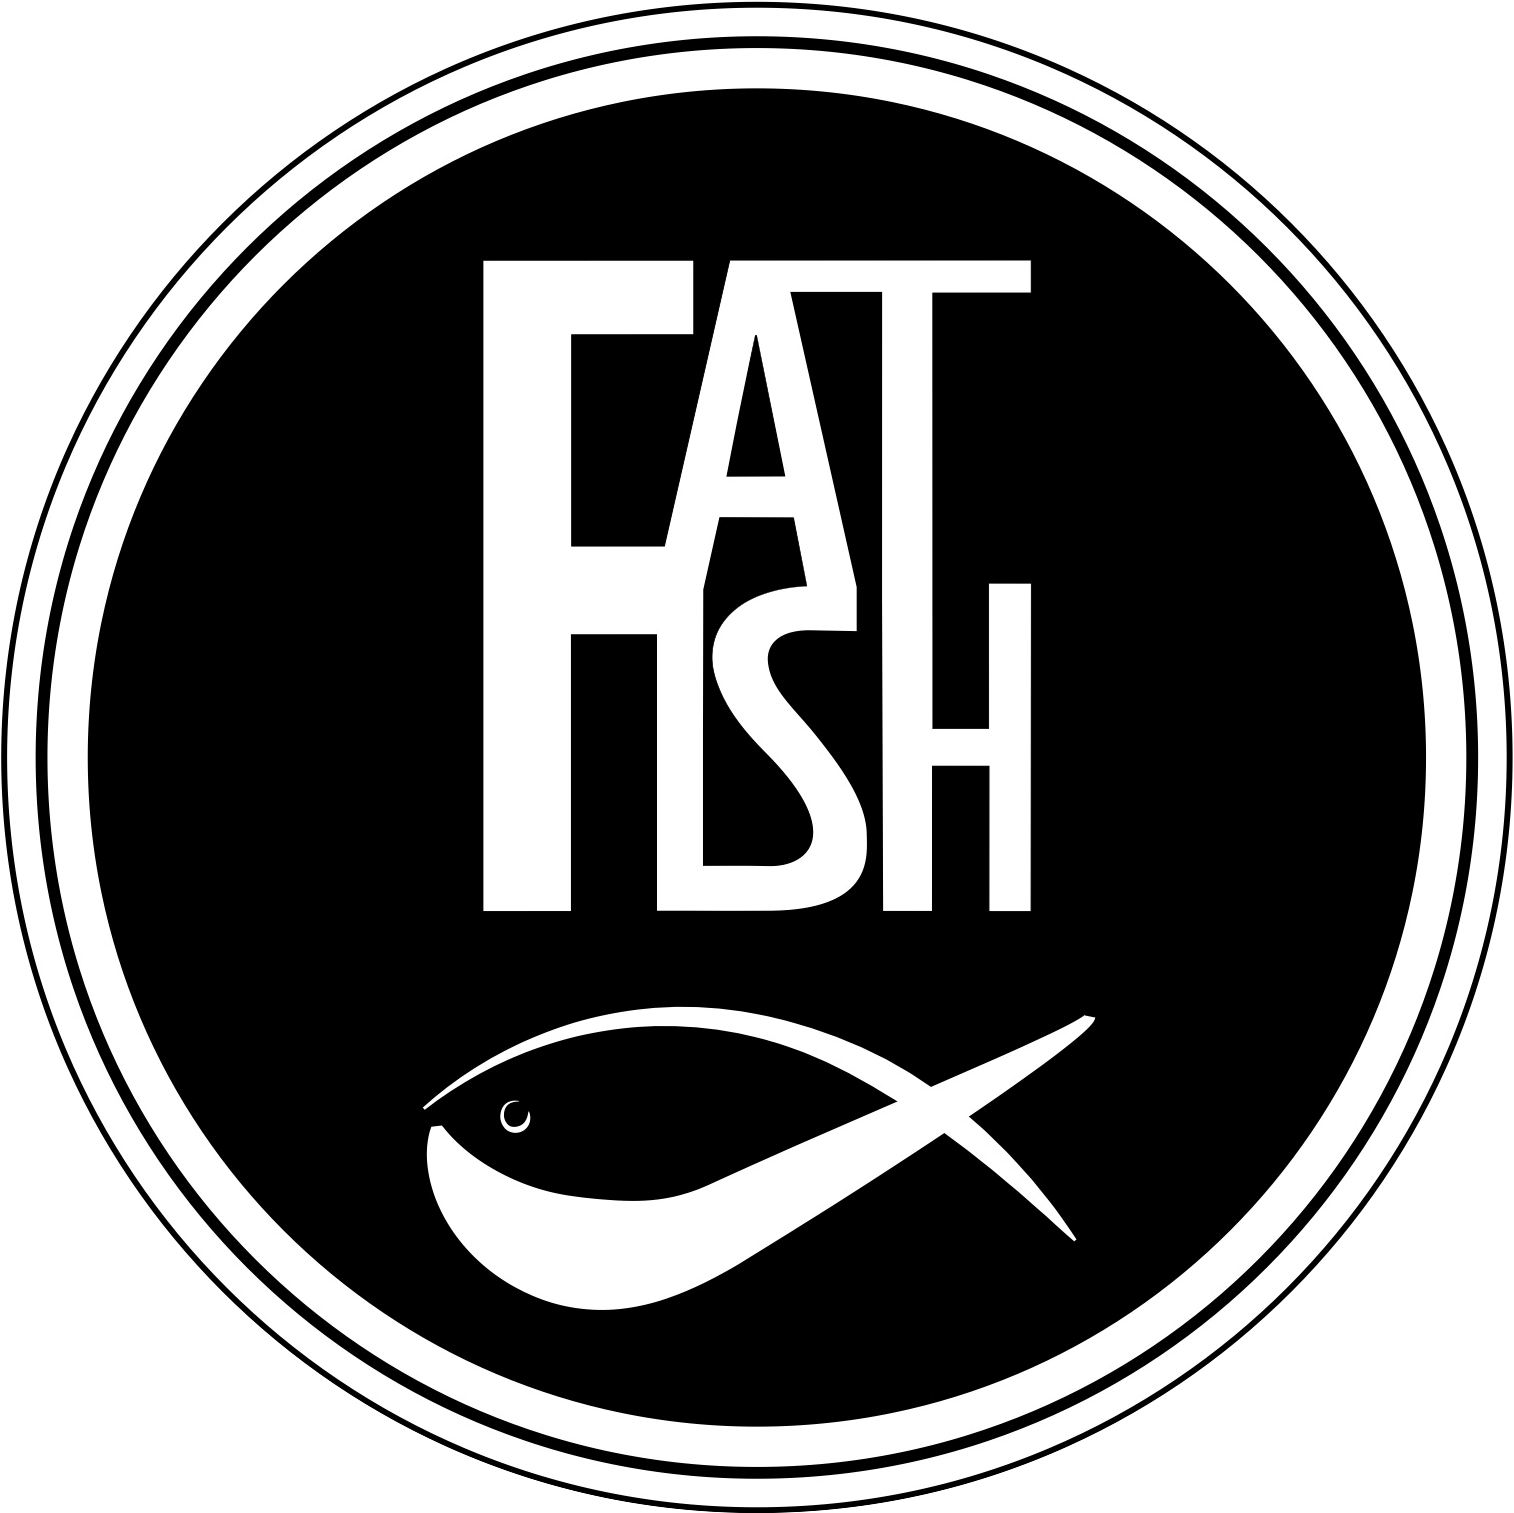 fat fish .png